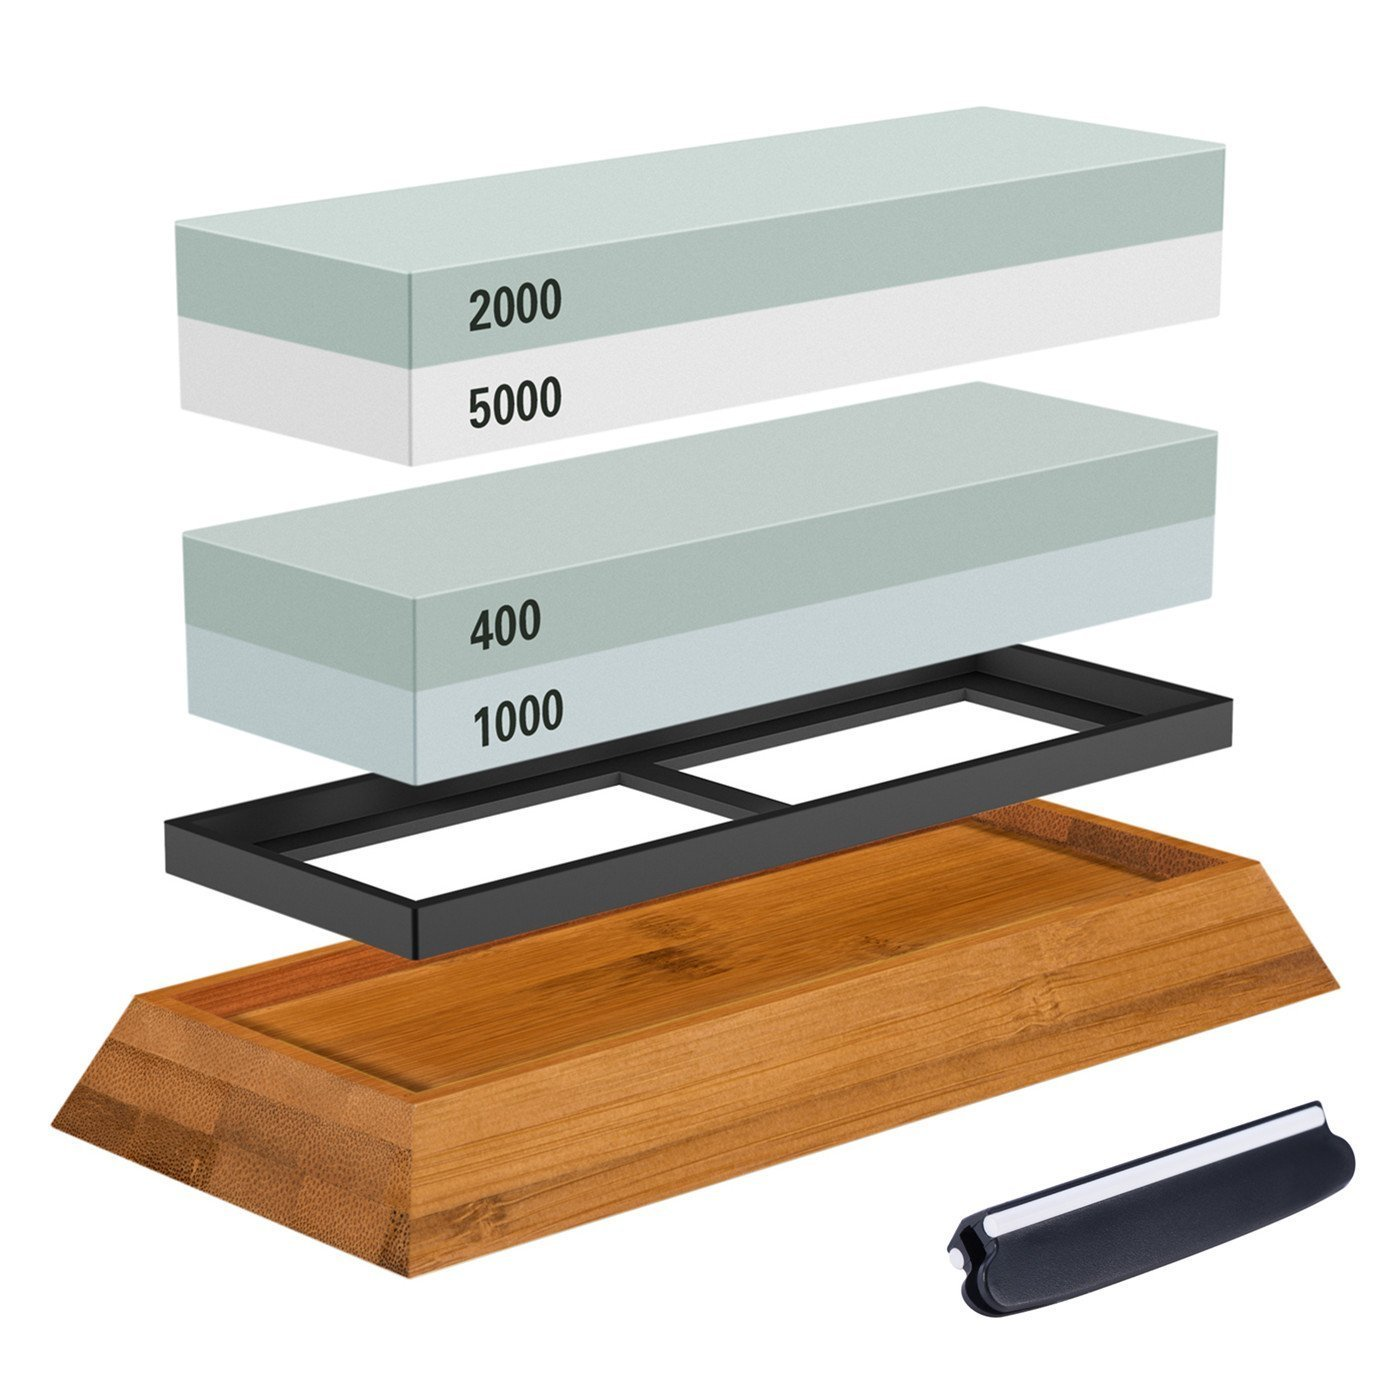 Premium Knife Sharpening Stone Kit, ASEL 4 Side 400/1000 2000/5000 Grit Whetstone, Best Kitchen Blade Sharpener Stone, Non-Slip Bamboo Base and Bonus Angle Guide Included by ASEL (Image #1)